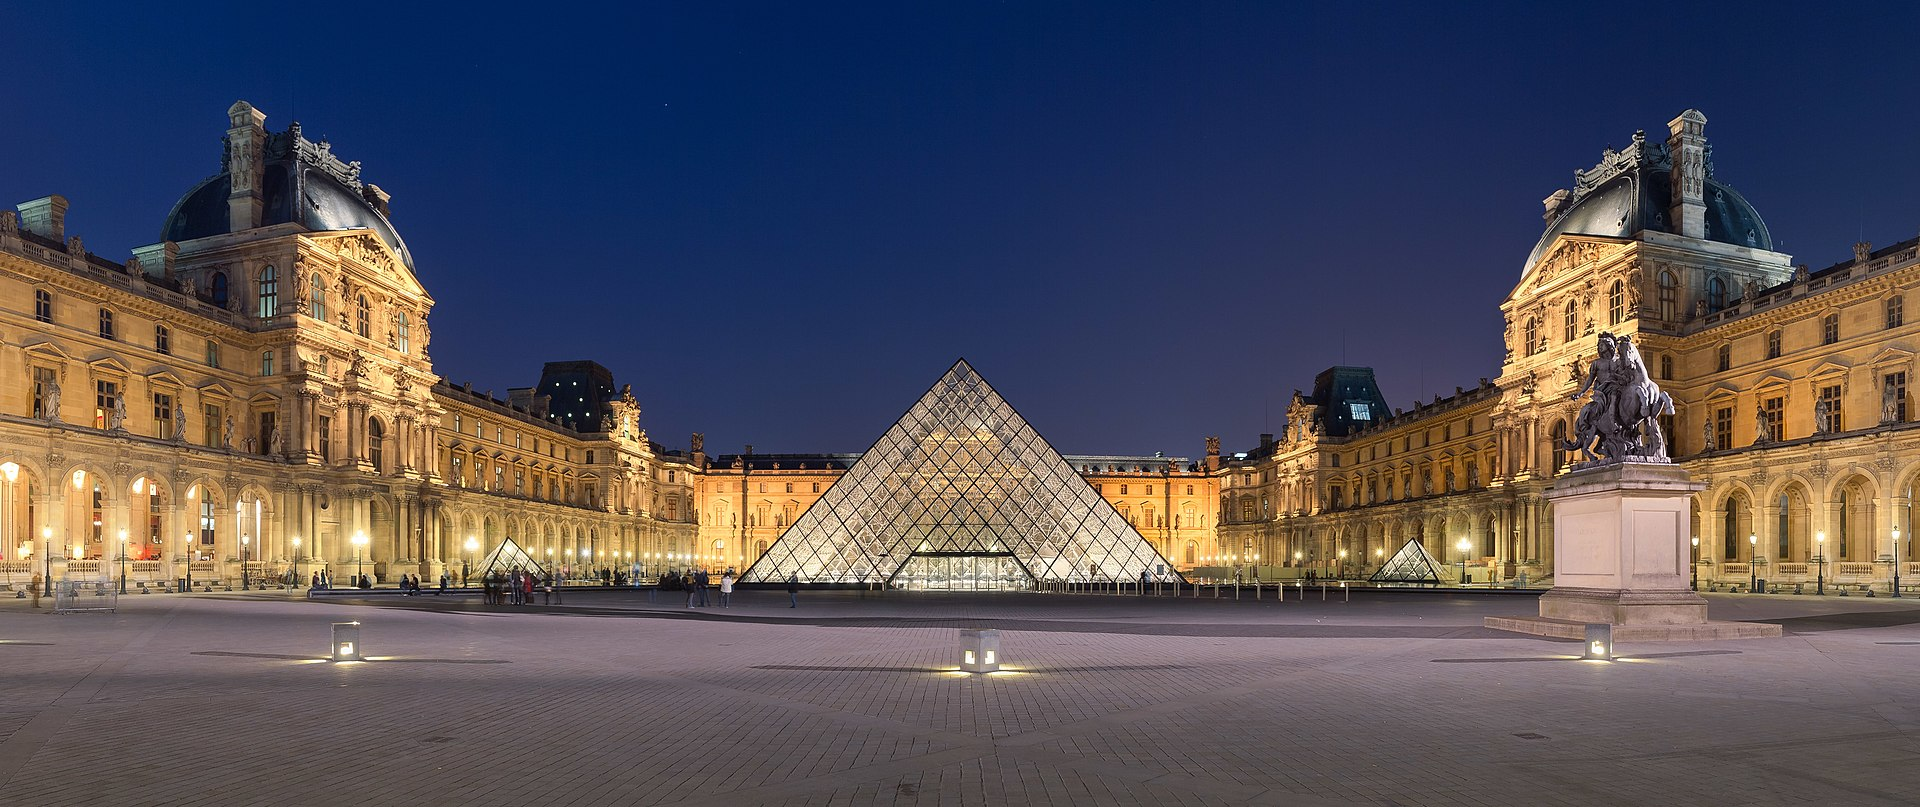 A Pirâmide do Museu do Louvre